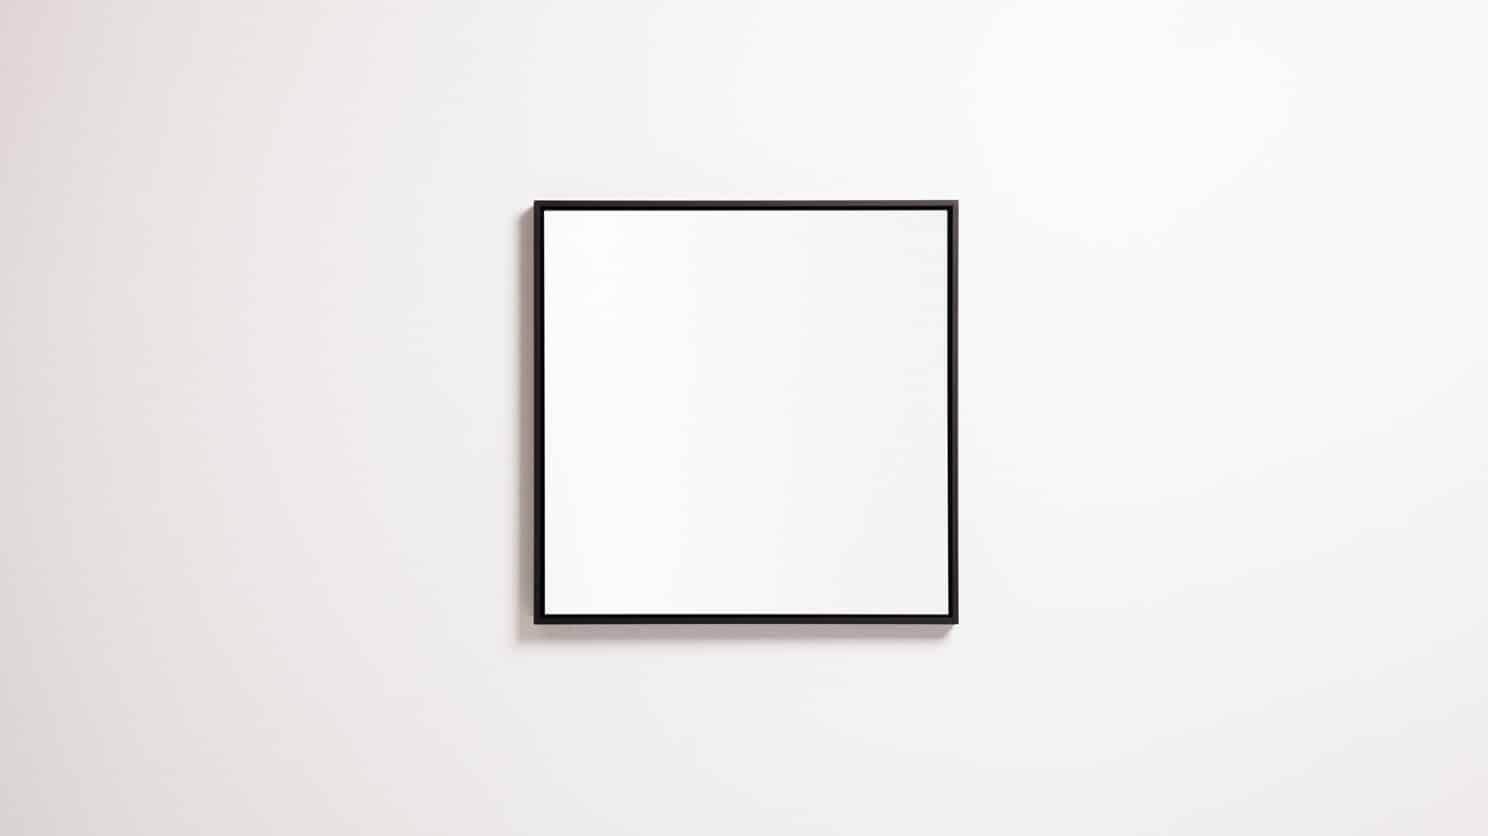 3130 044 1 1 mirror spy square black front